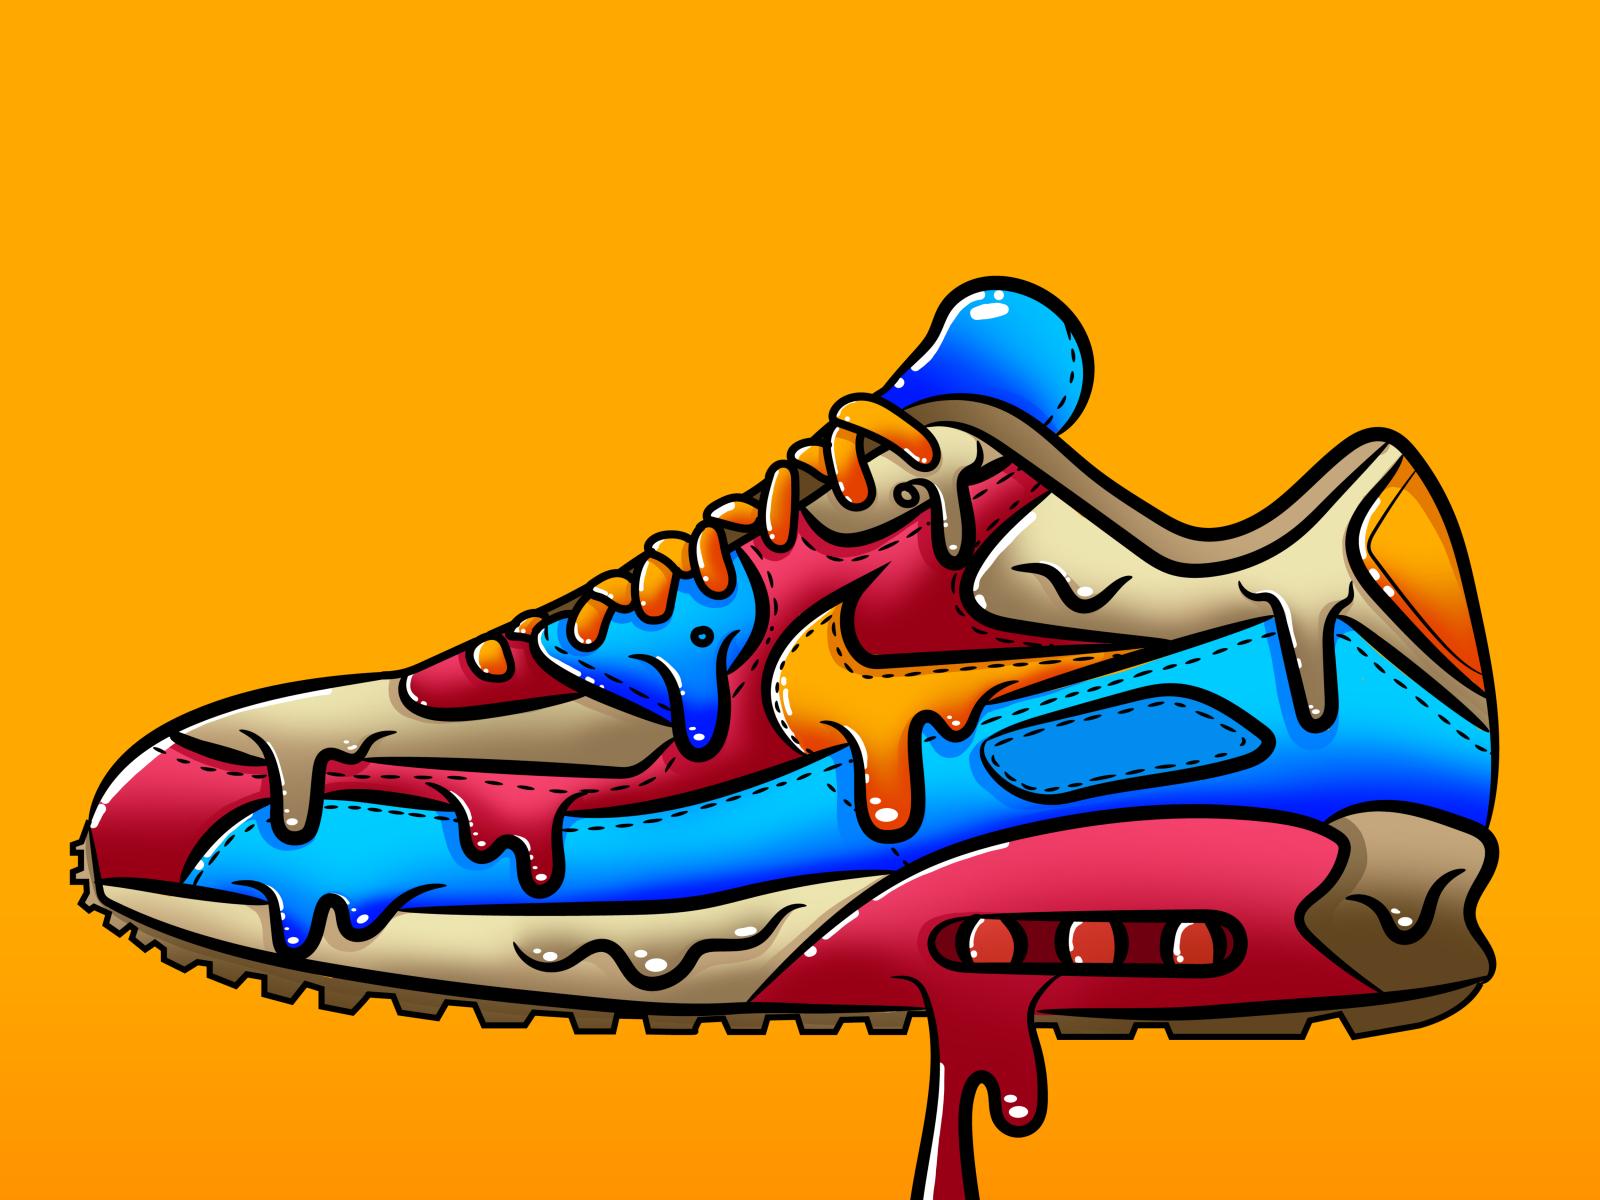 Nike Drip Sneaker By Munashe Dominic Fudge Mabvoro On Dribbble